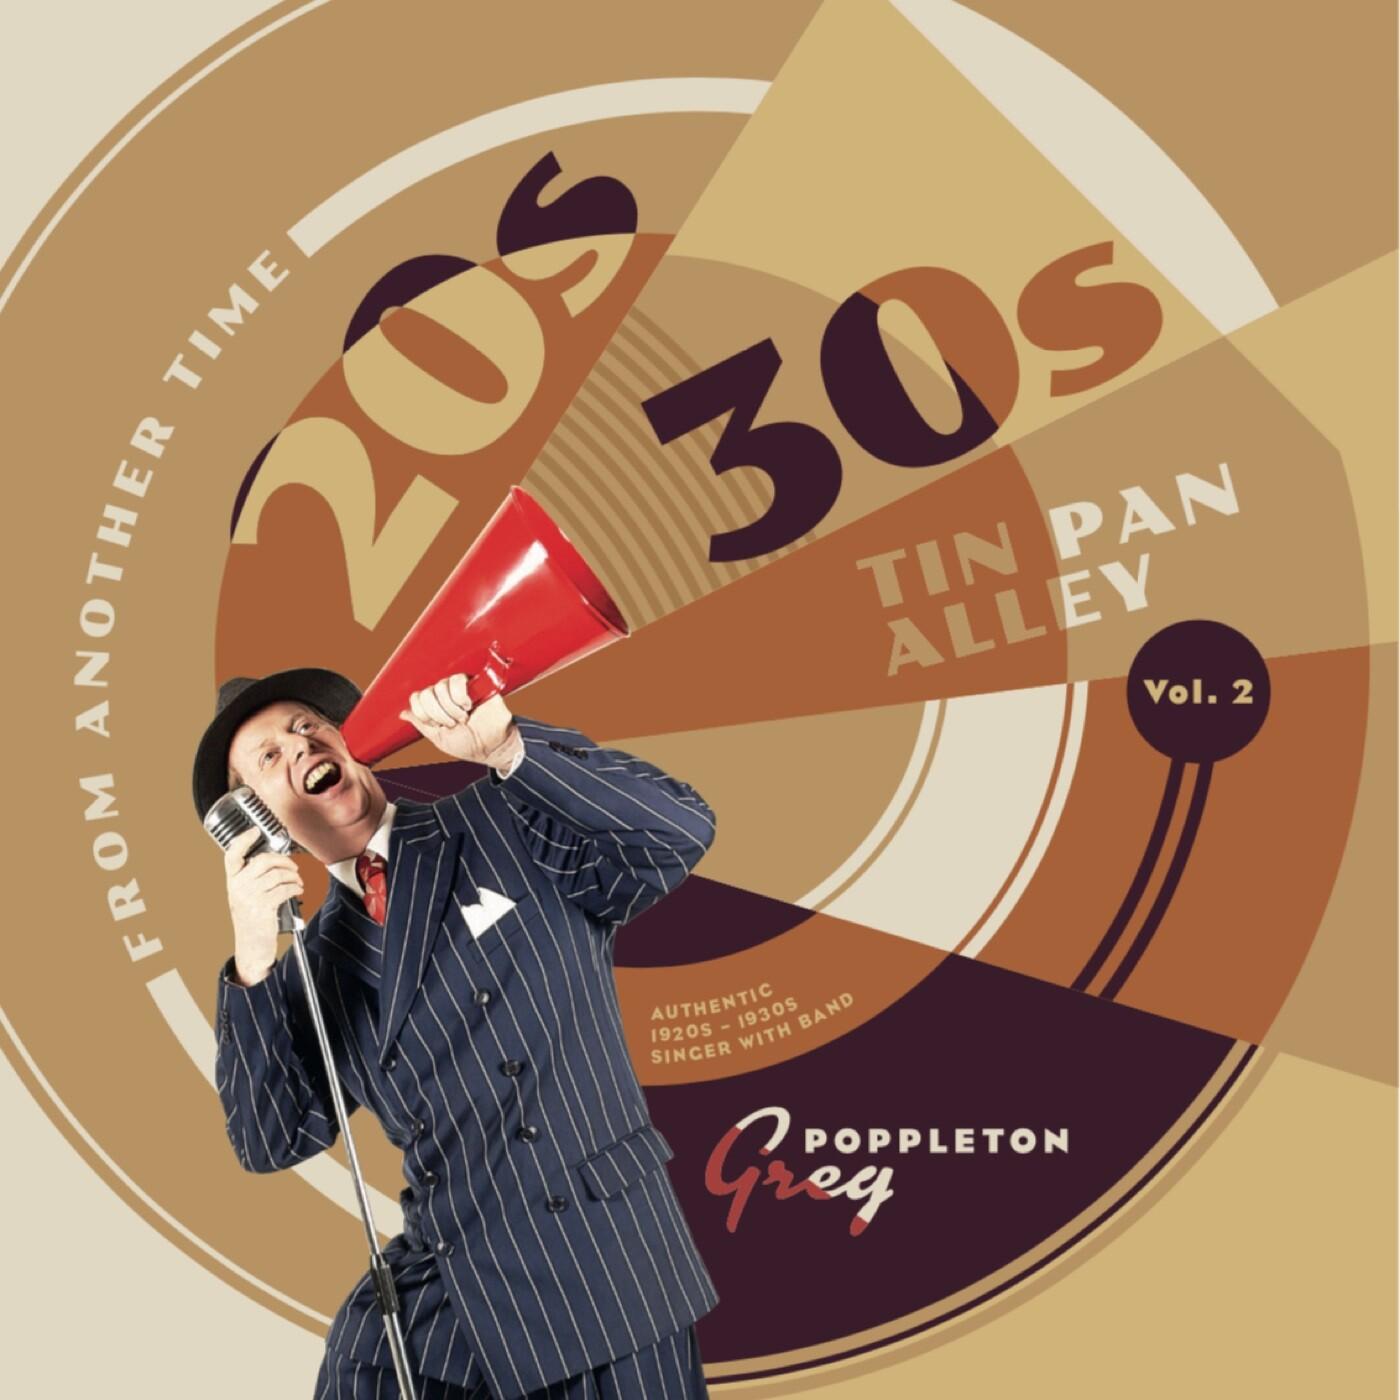 Cover-Tin-Pan-Alley-Greg-Poppleton-Vol-2